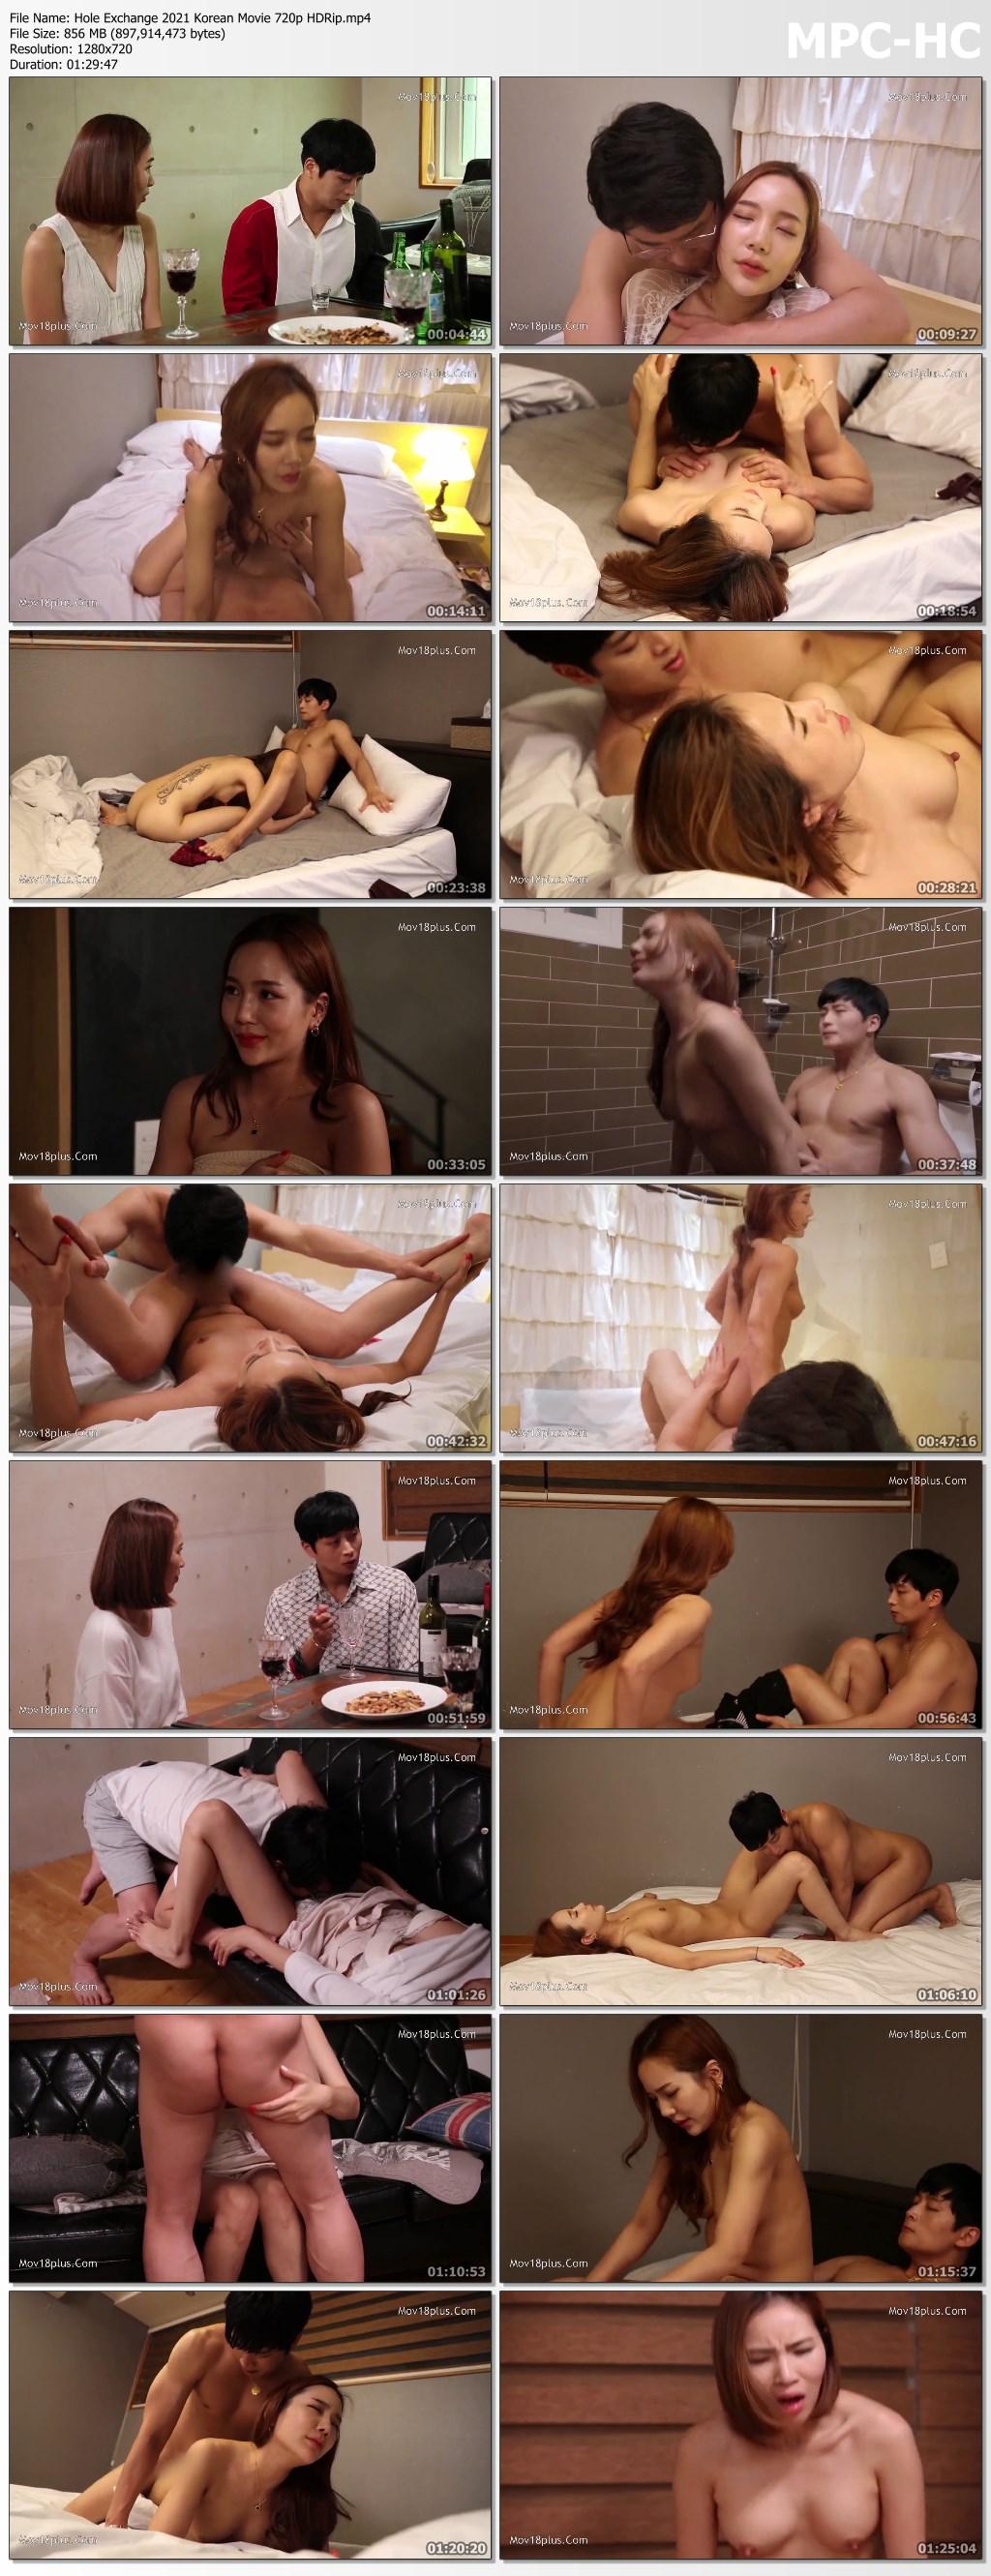 Hole Exchange 2021 Korean Movie 720p HDRip.mp4 thumbs